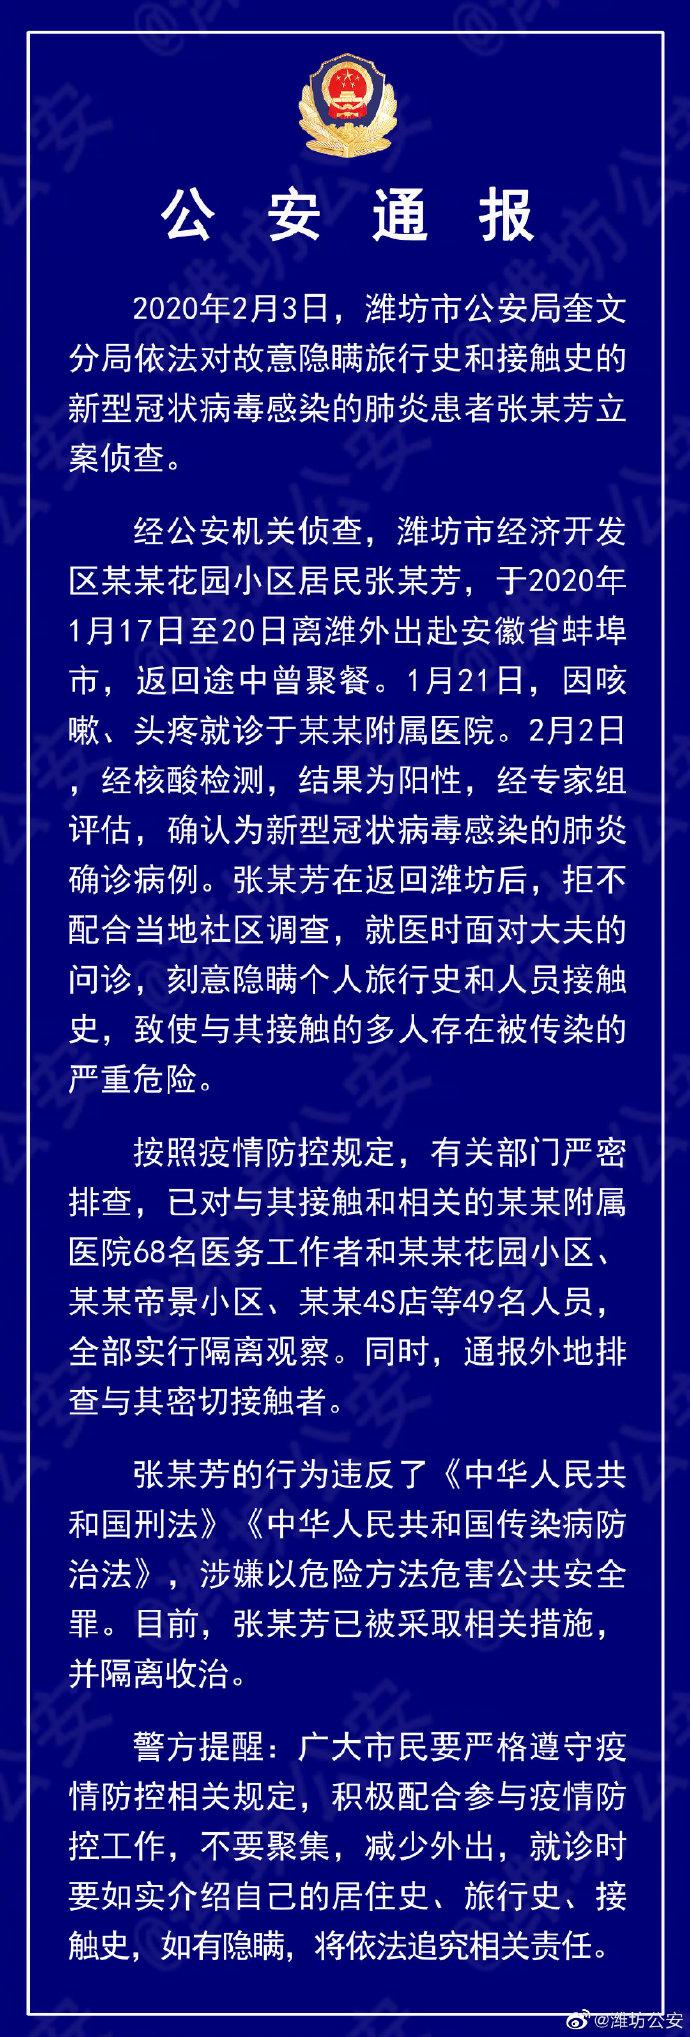 確診(zhen)新(xin)型tou)fei)炎(yan)患者(zhe)隱(yin)瞞致(zhi)68名(ming)醫務人員(yuan)被隔離(li) 警方立案